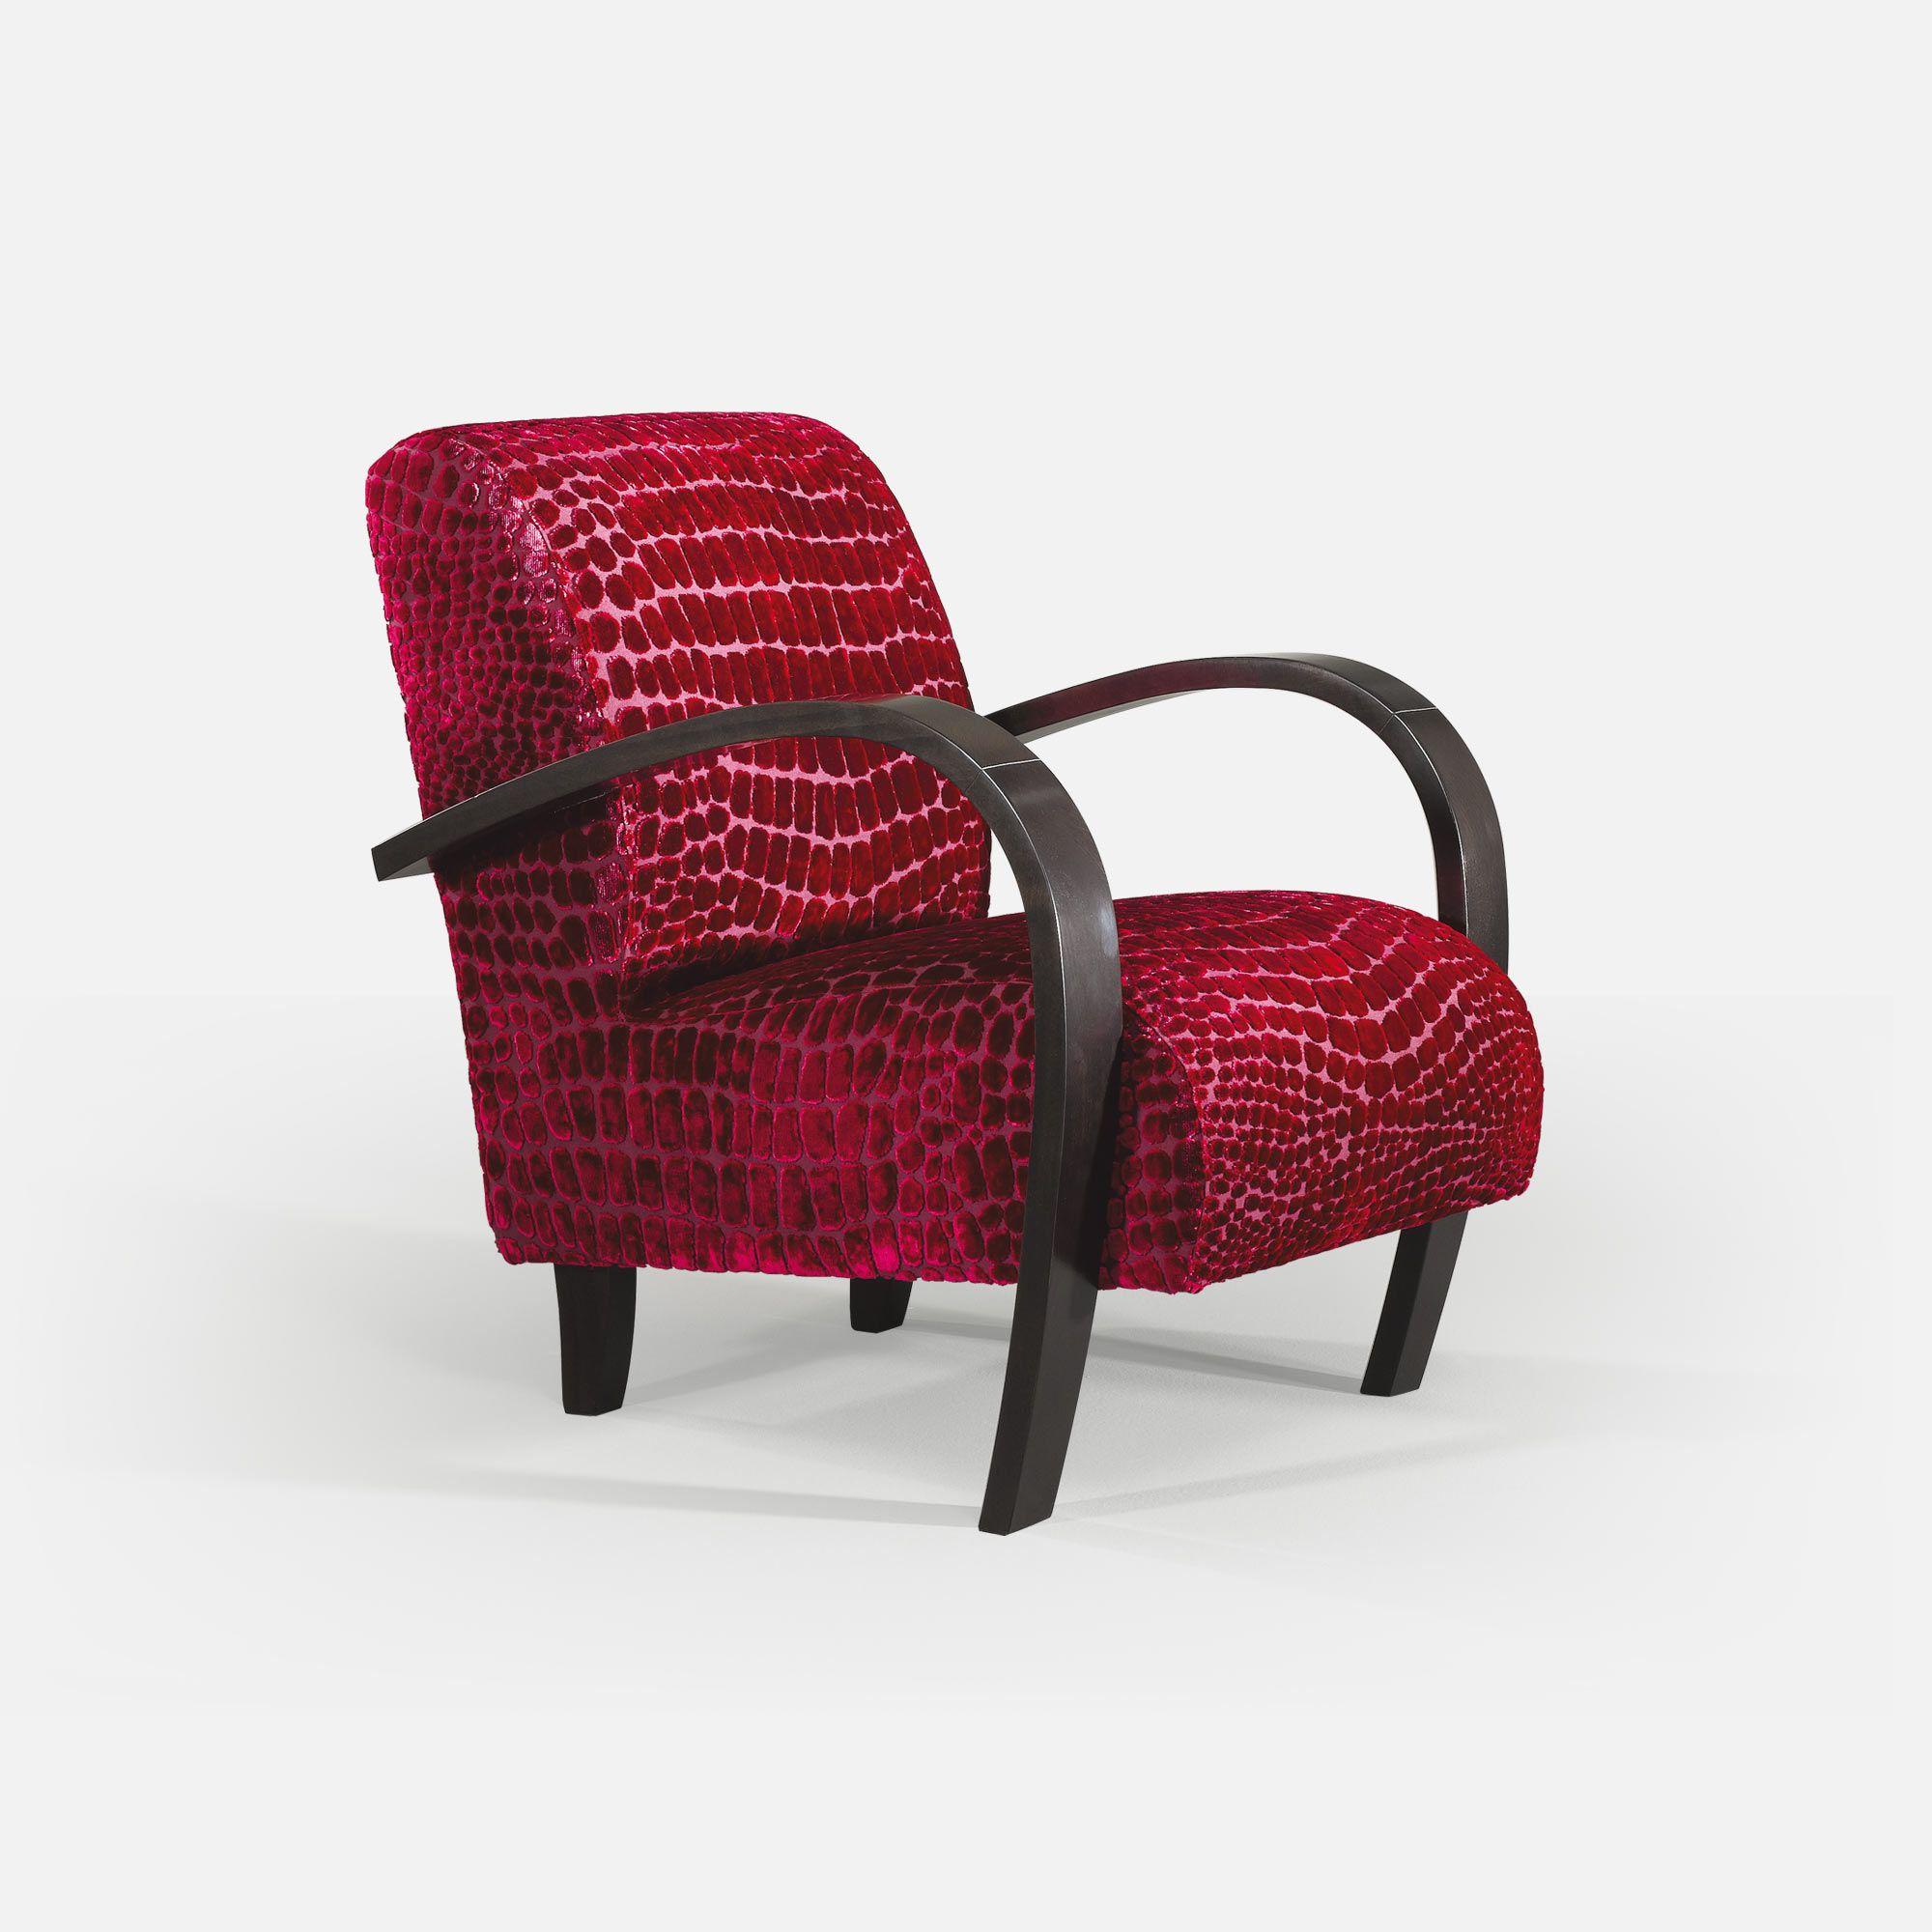 armchair for hotel restaurant bar d 233 co 30 collinet